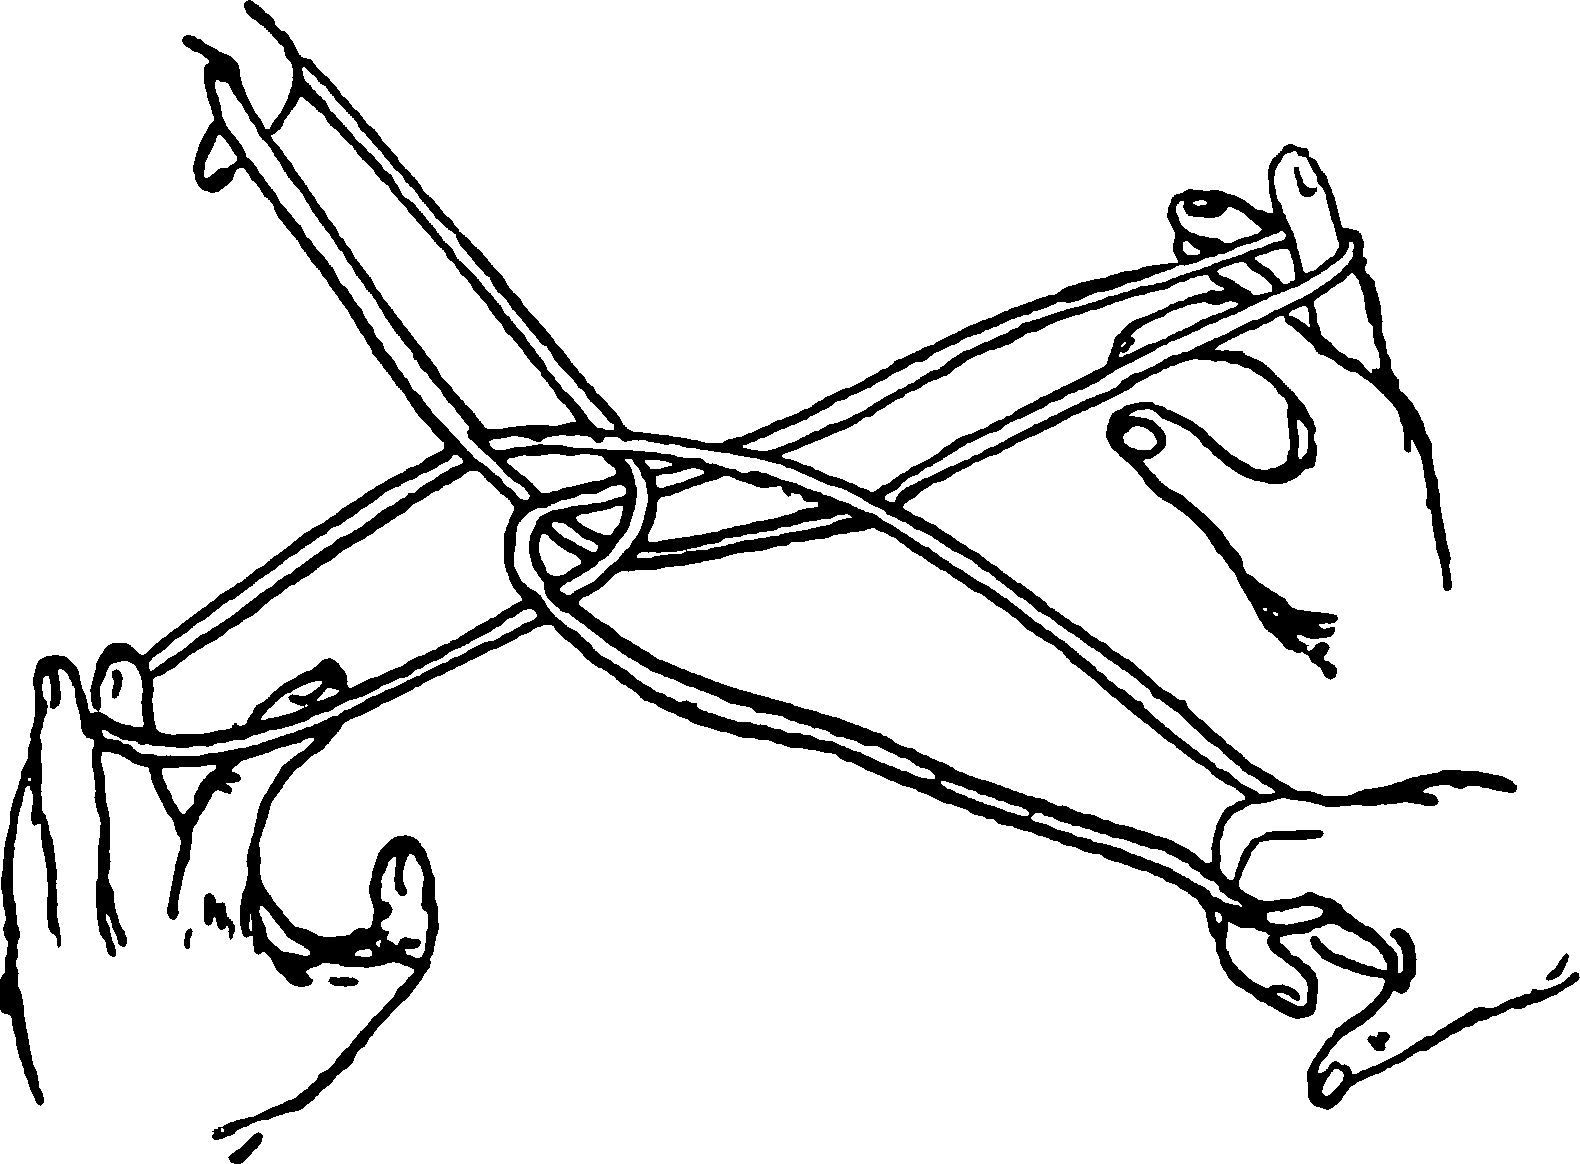 1580x1164 Saw String Games